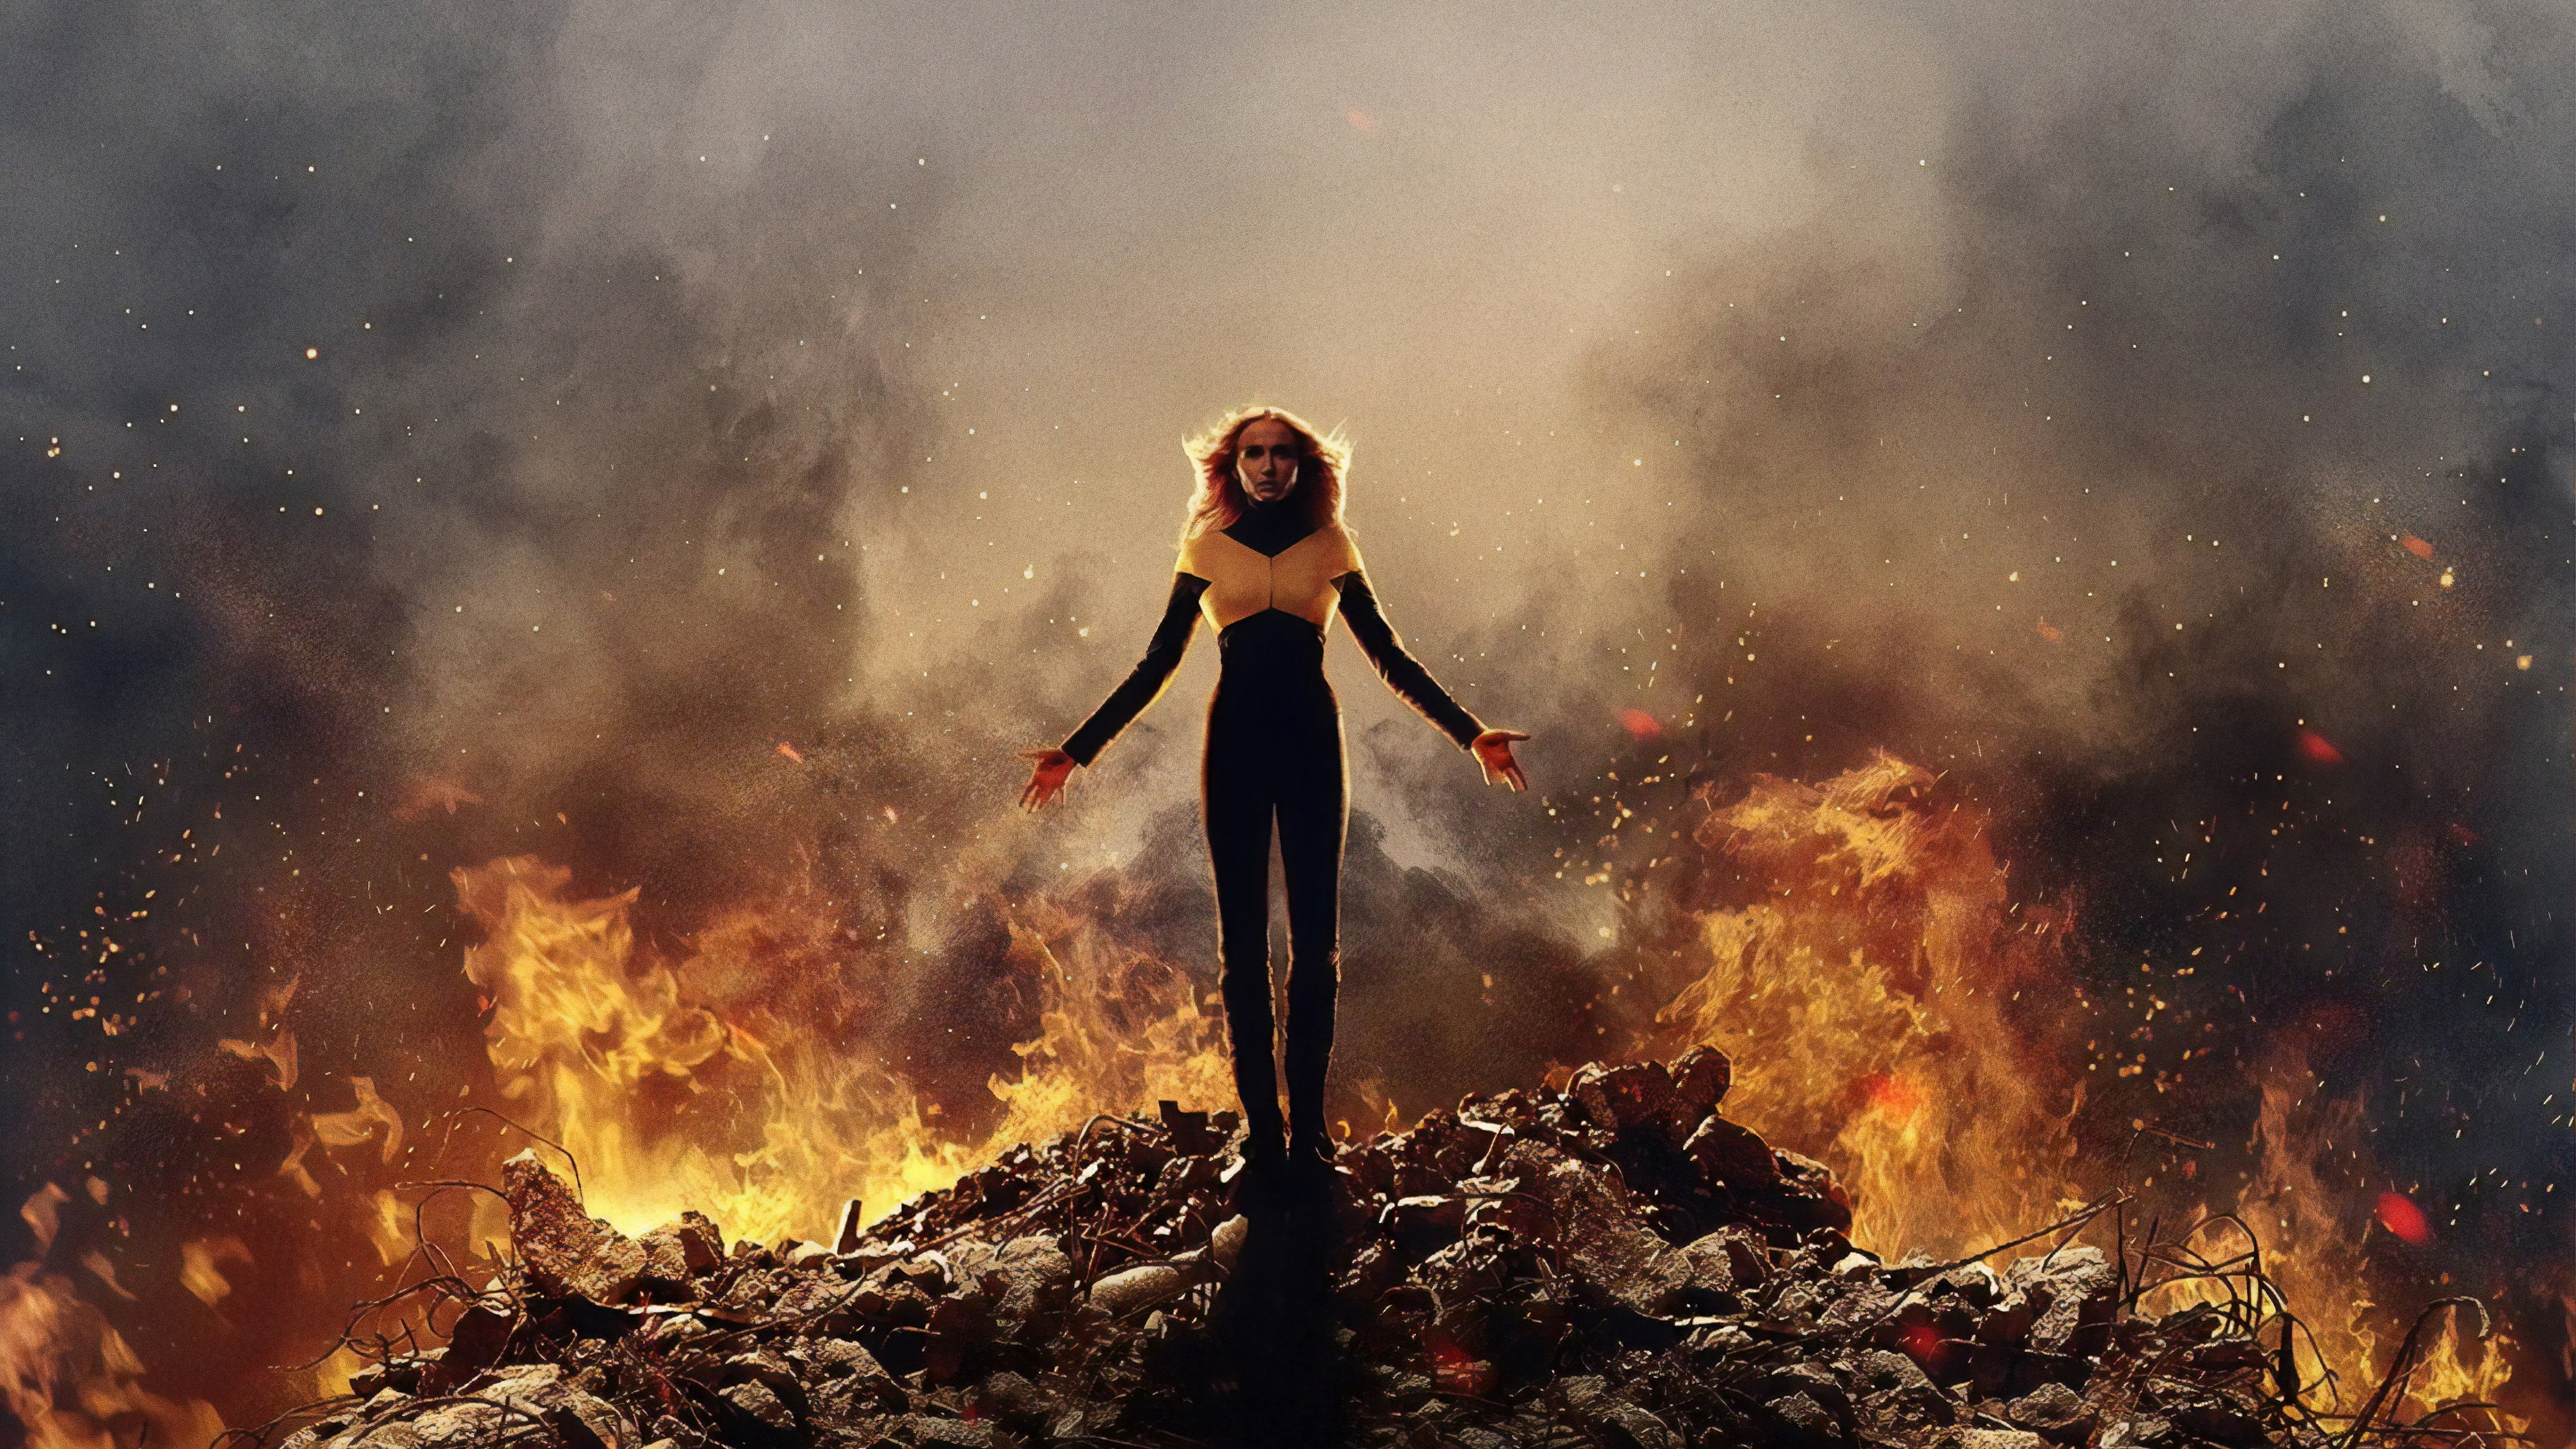 x men dark phoenix 4k 2019 1560535019 - X Men Dark Phoenix 4k 2019 - x men dark phoenix wallpapers, sophie turner wallpapers, movies wallpapers, hd-wallpapers, dark phoenix wallpapers, 4k-wallpapers, 2019 movies wallpapers